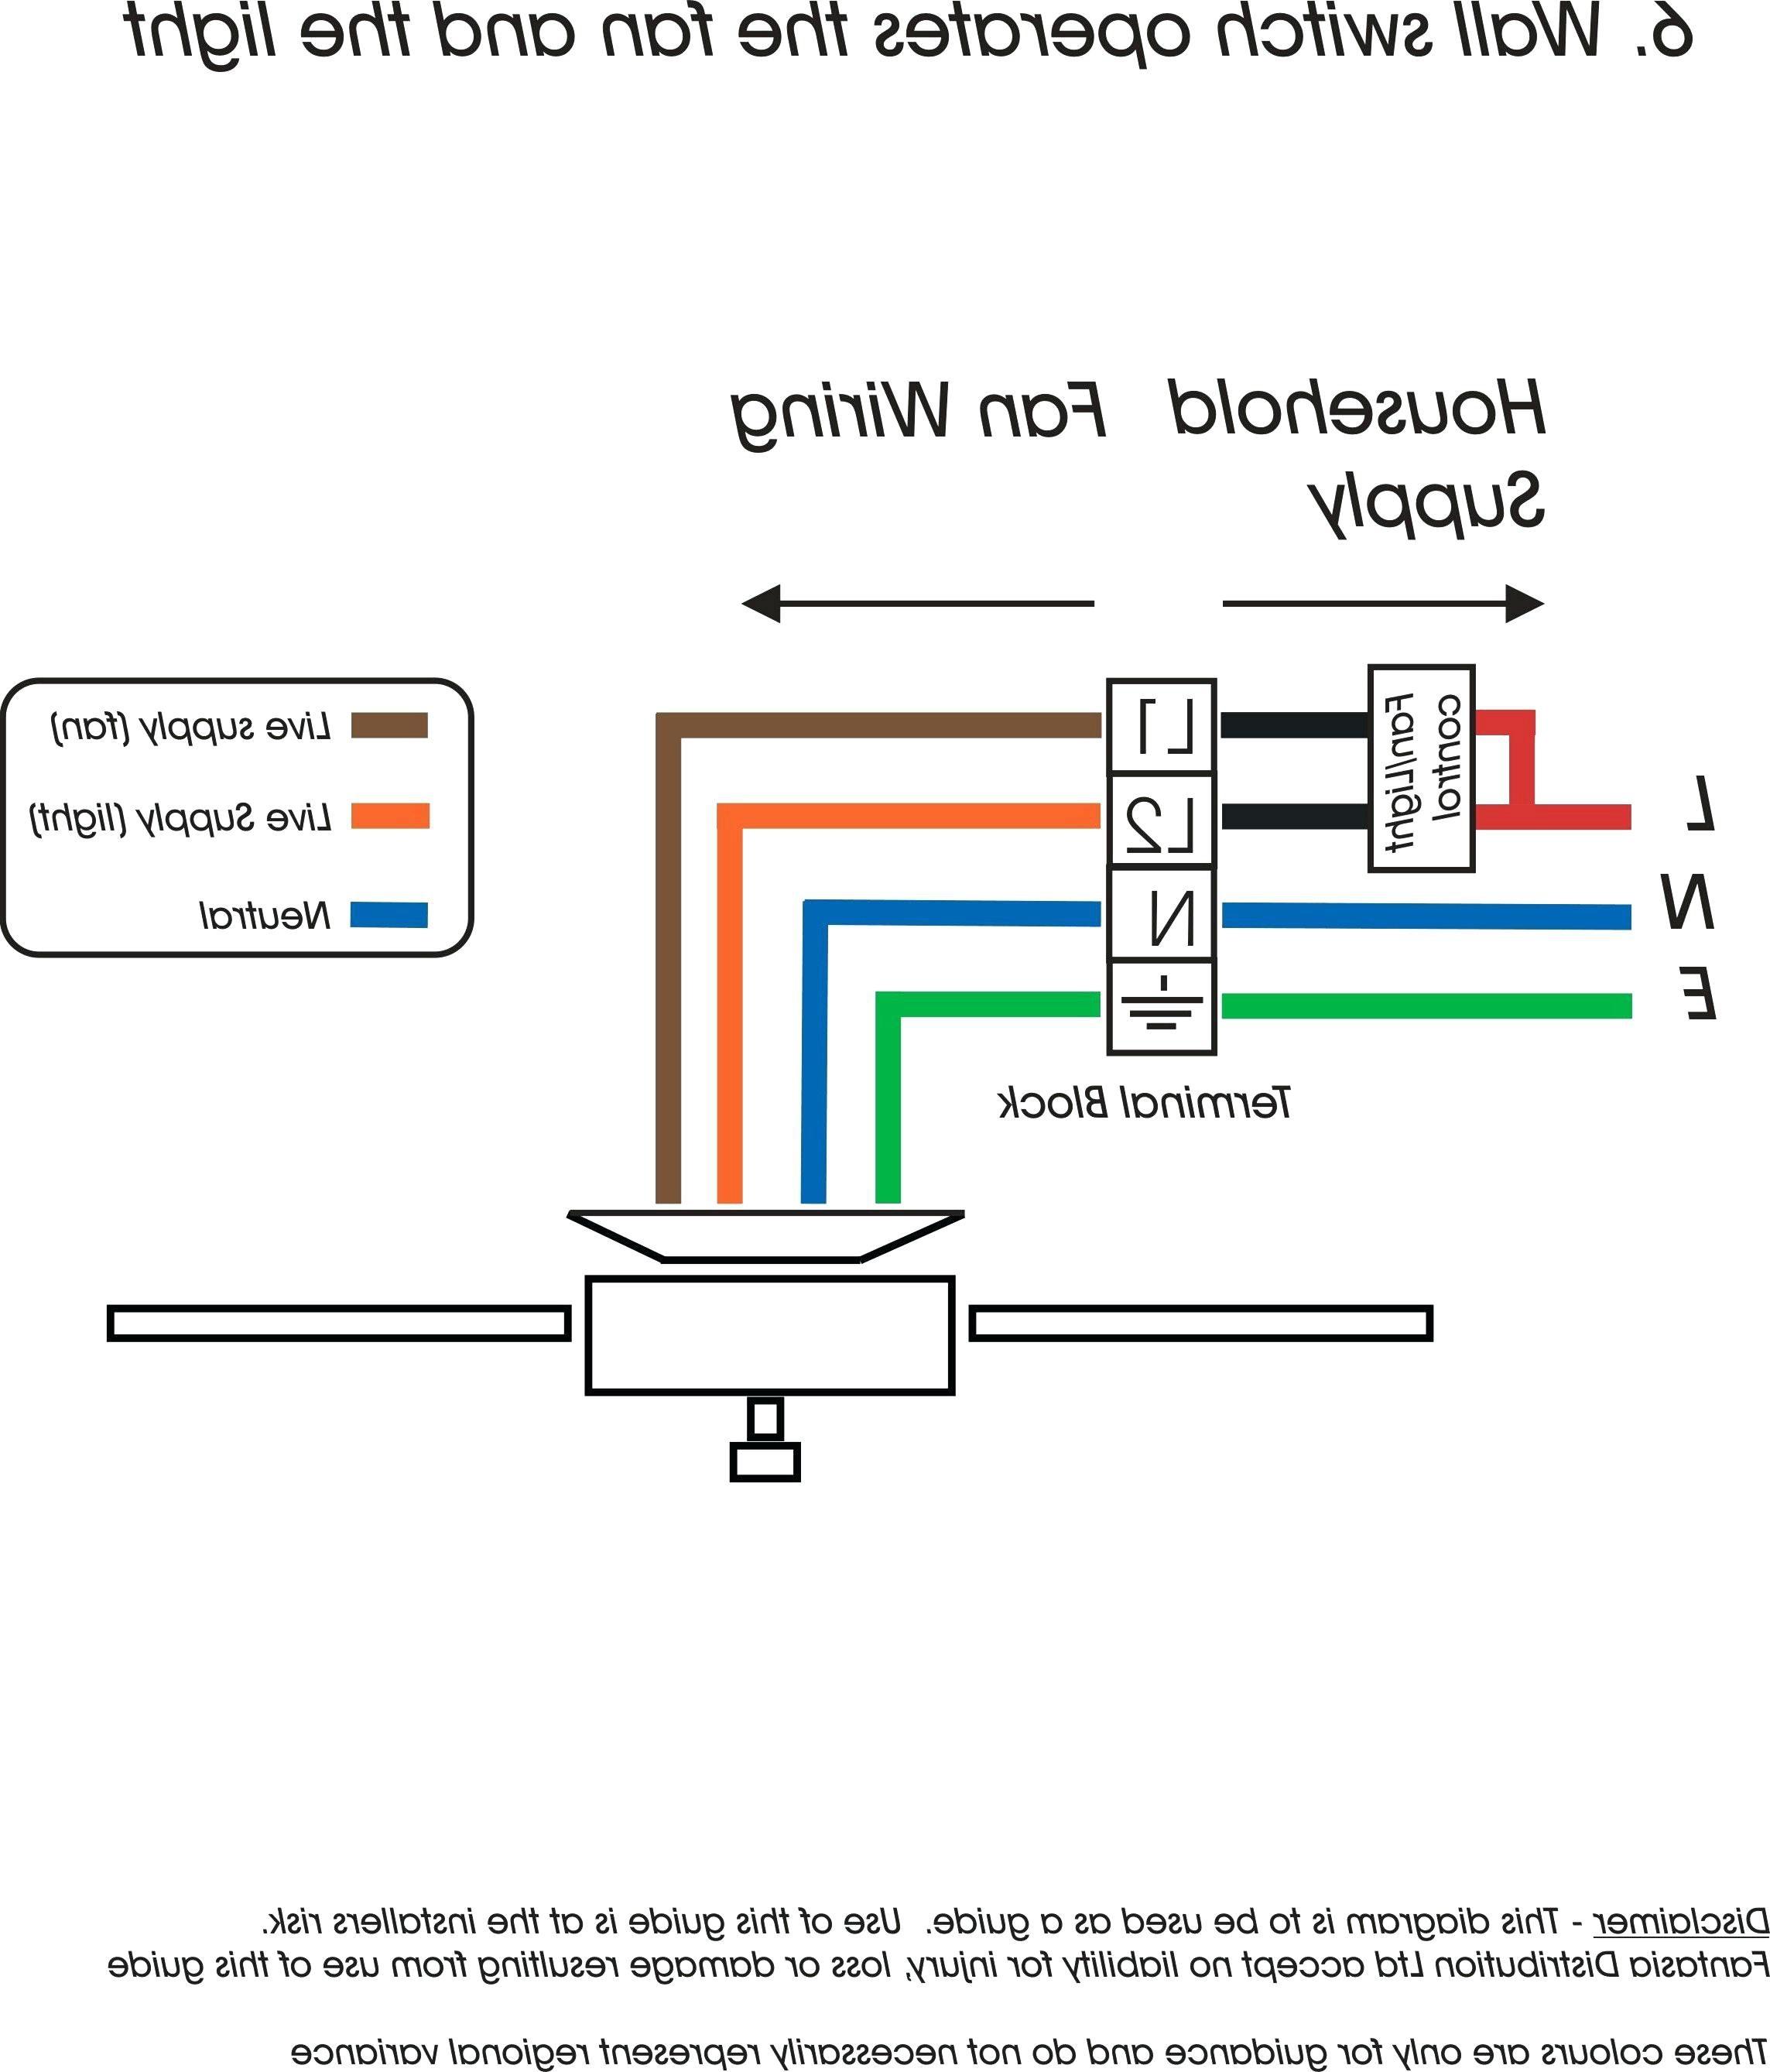 Mishimoto Fan Controller Wiring Diagram - Mishimoto Fan Controller Wiring Diagram Elegant Electric Fan Wiring Diagram Diagram 5j